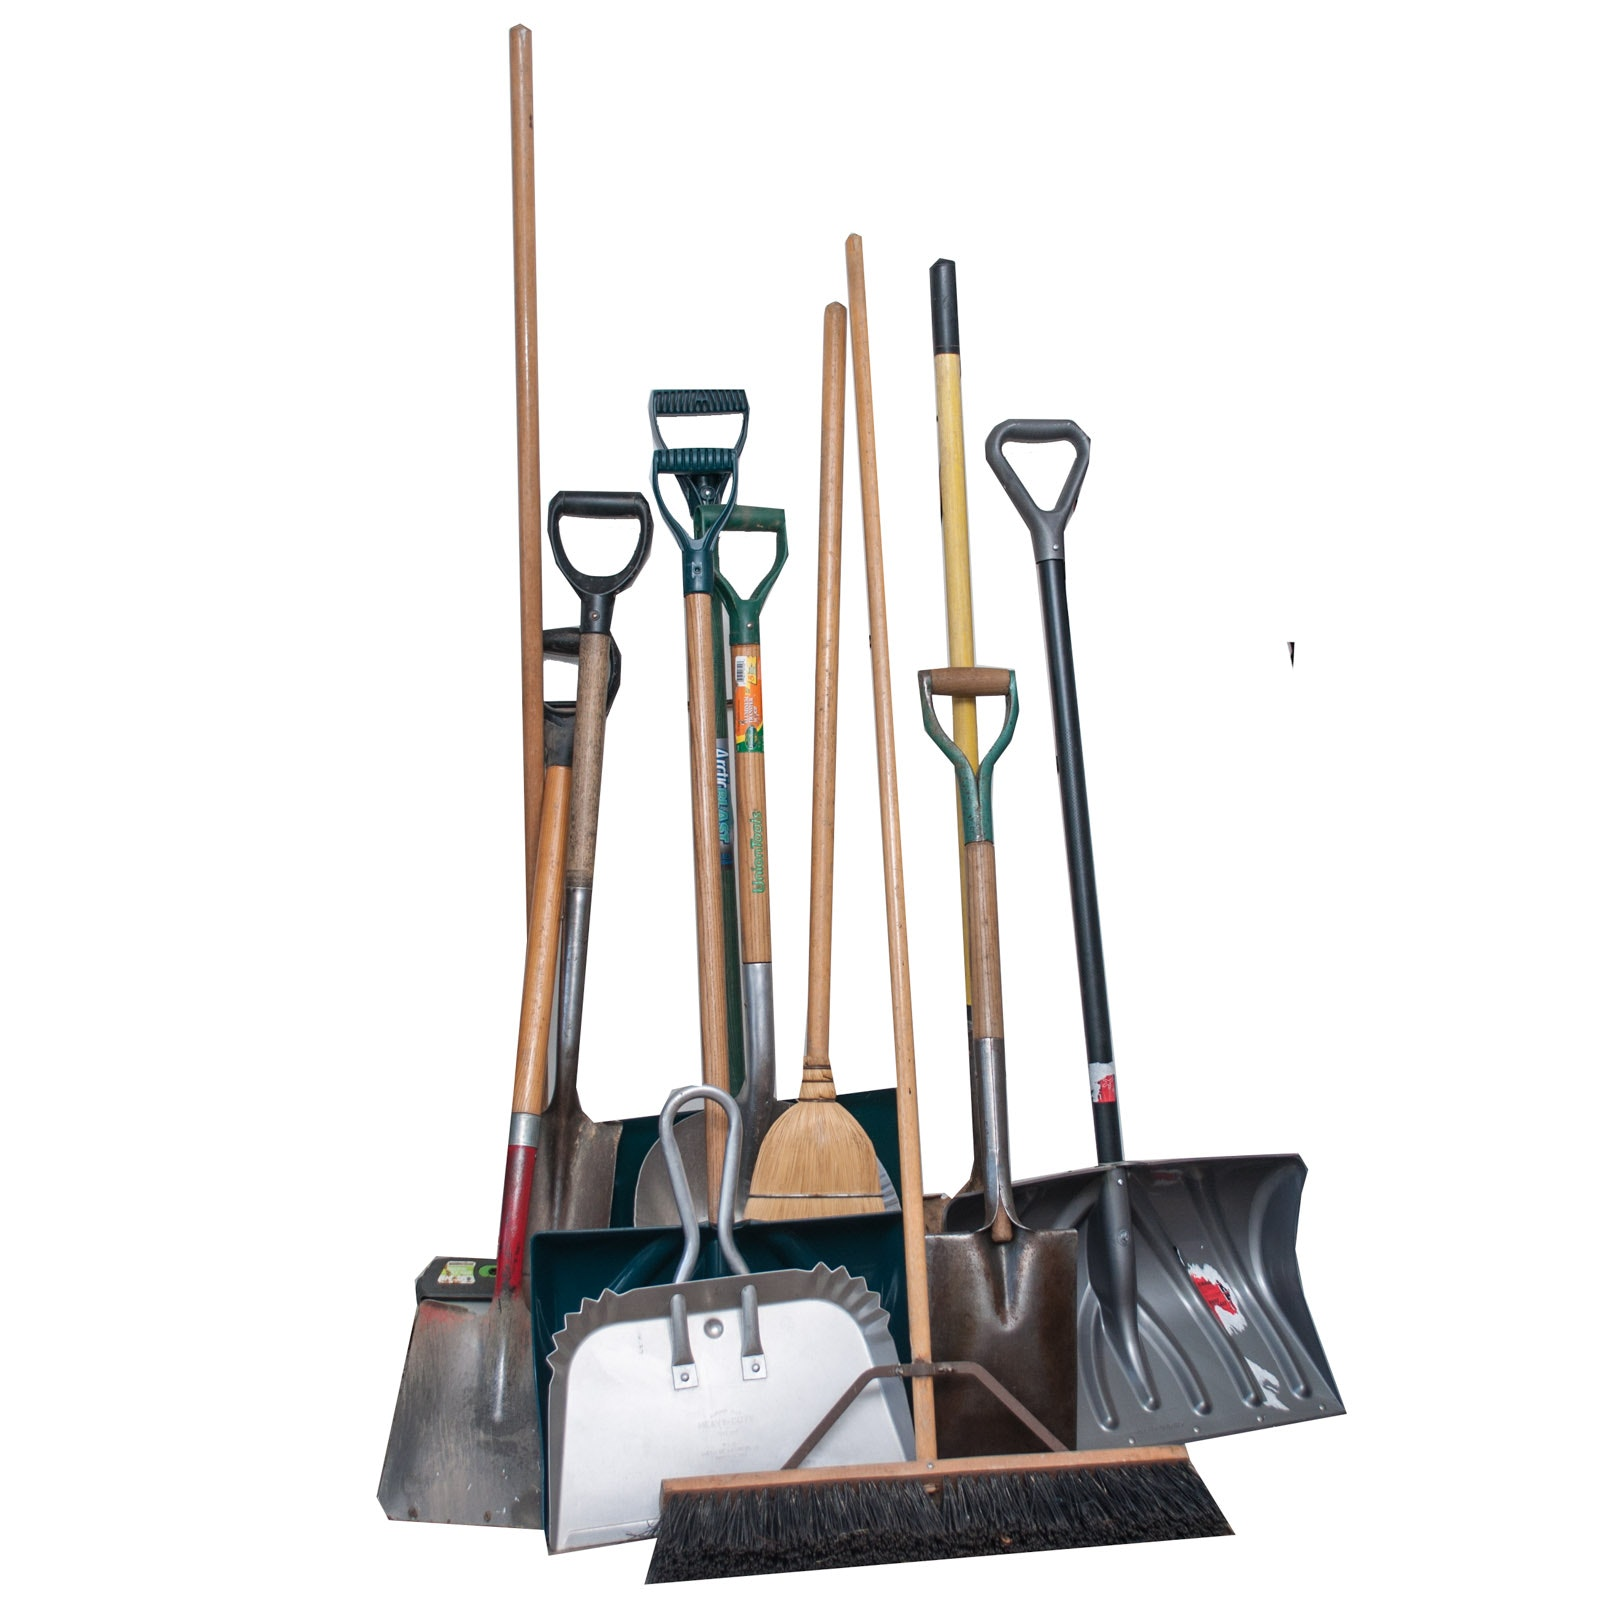 Assortment of Yard Tools